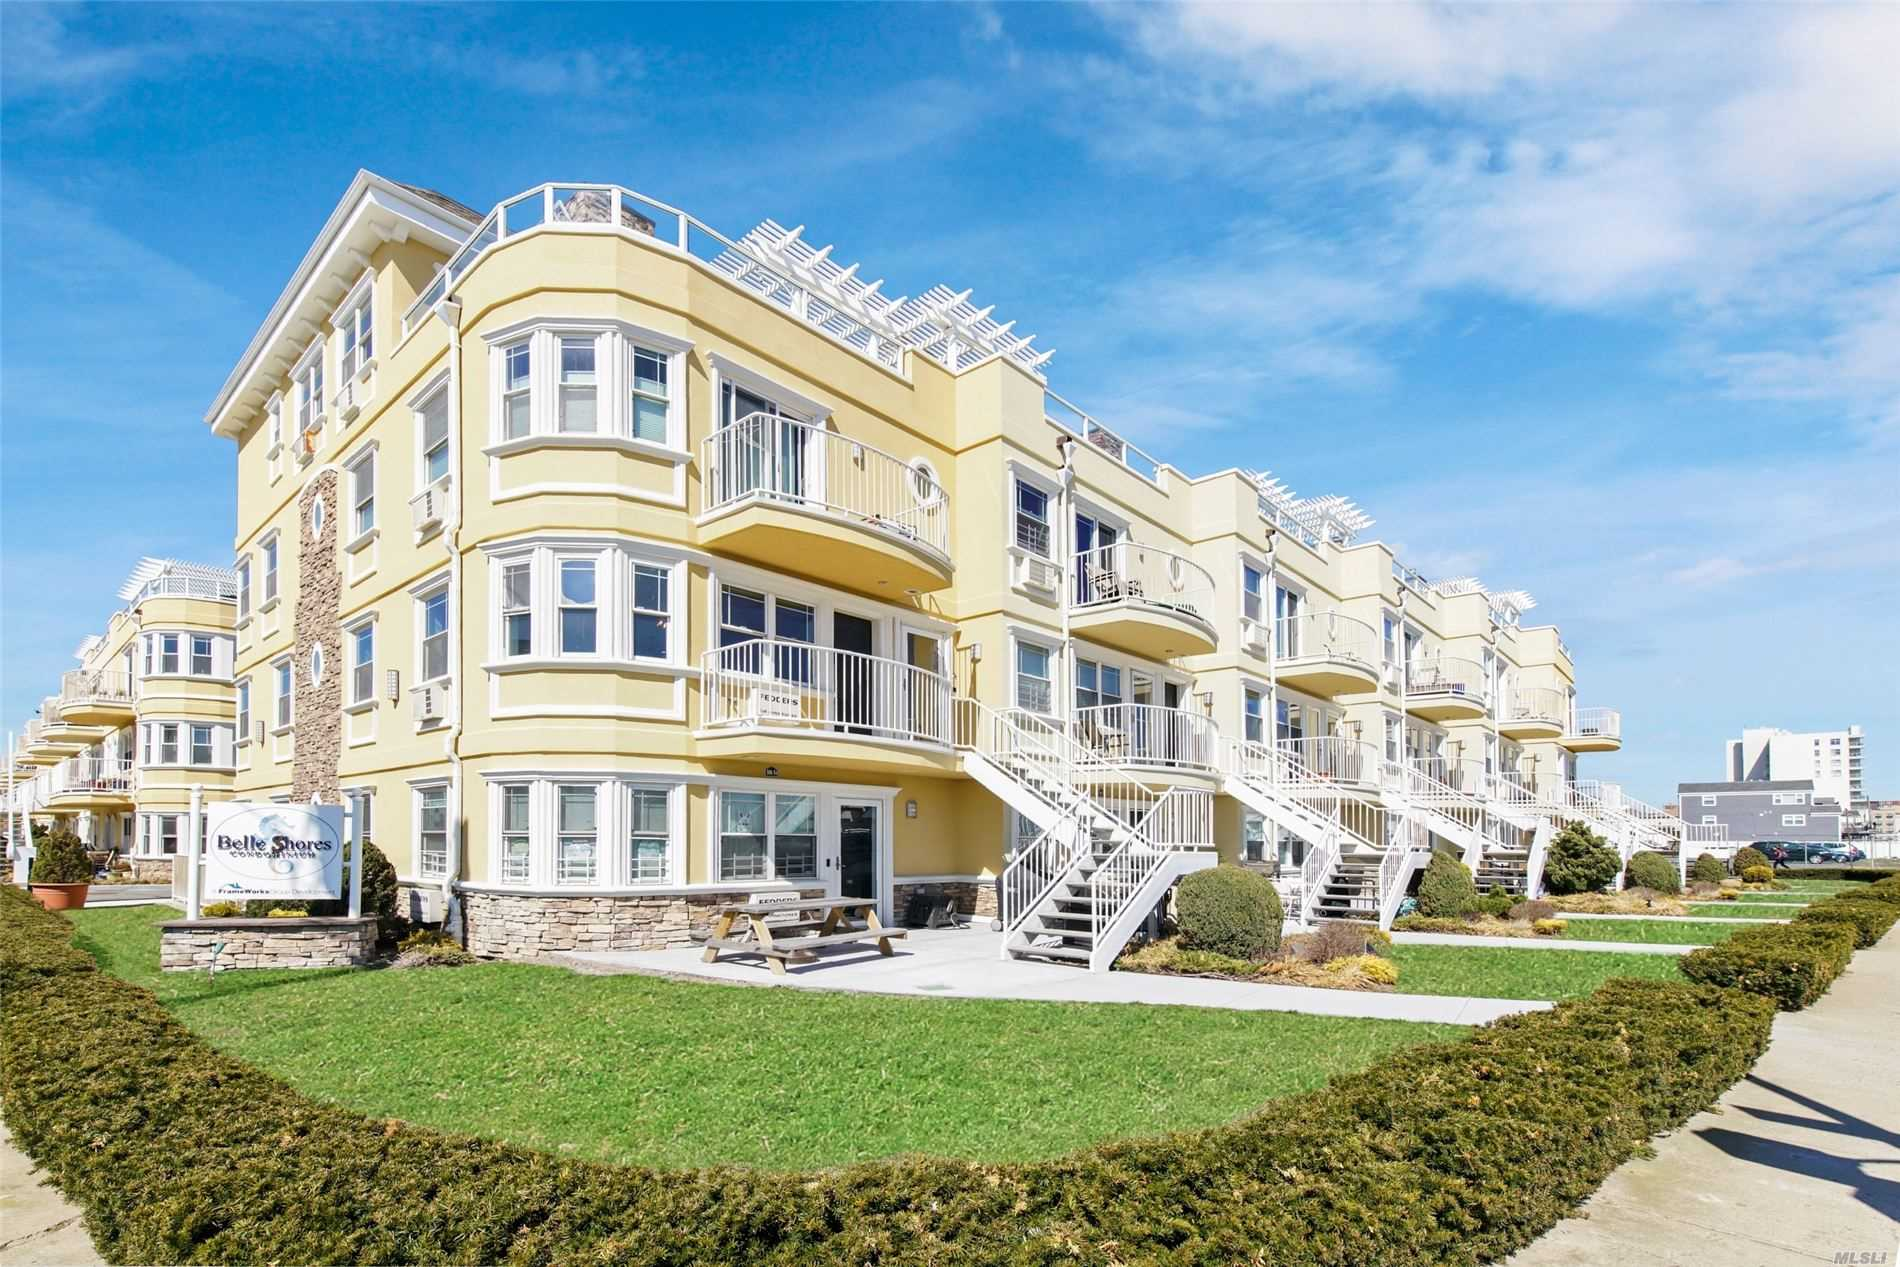 Property for sale at 100-14 Shore Front Parkway # 17B, Rockaway Park NY 11694, Rockaway Park,  New York 11694